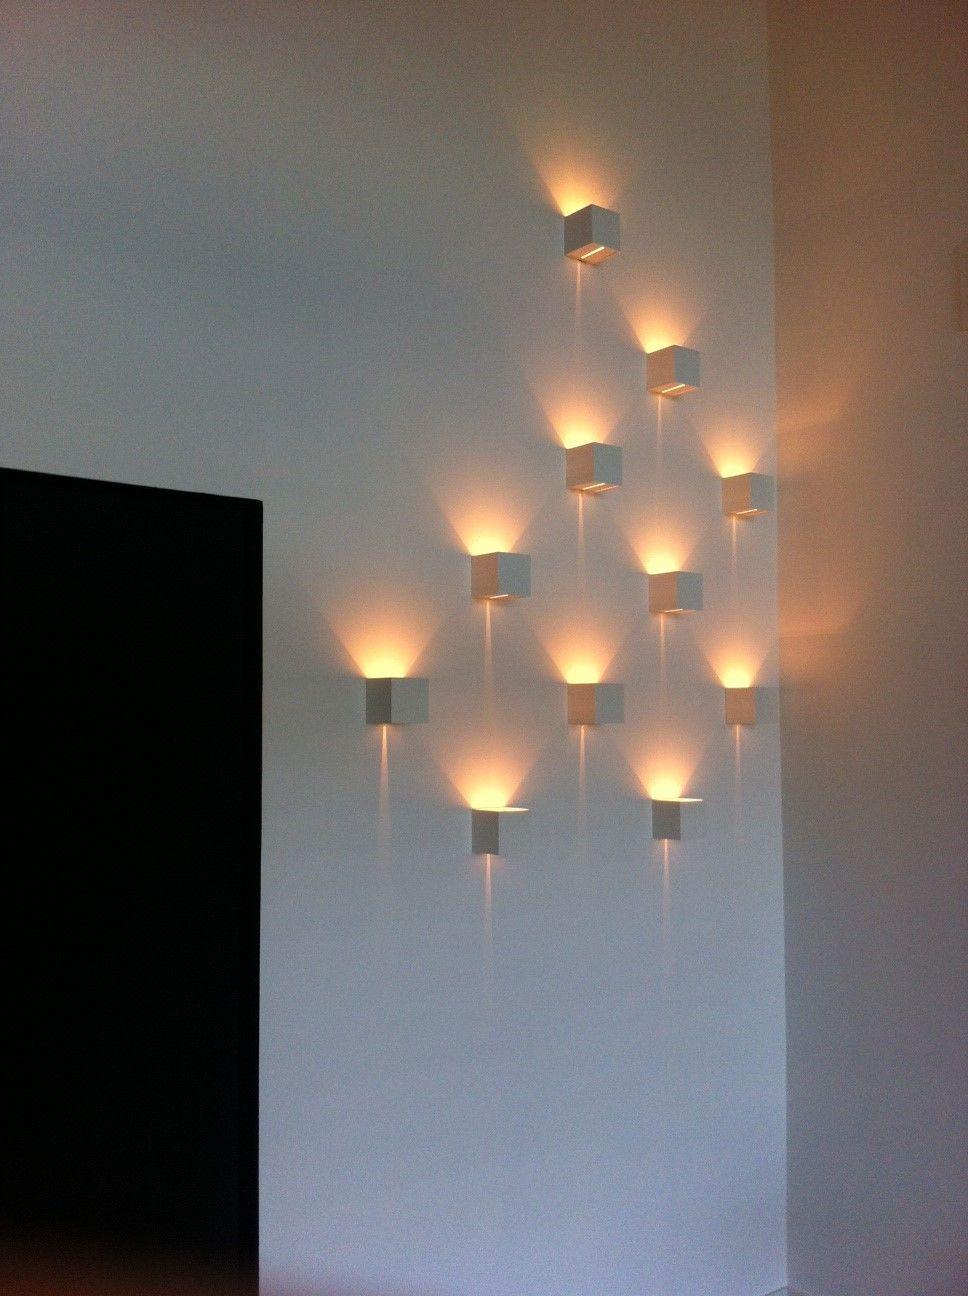 Project Hasselt BE bedrijf Youston #ArchitecturalLighting #design #Prolicht GLORIOUS DICE wall #LED #DARK